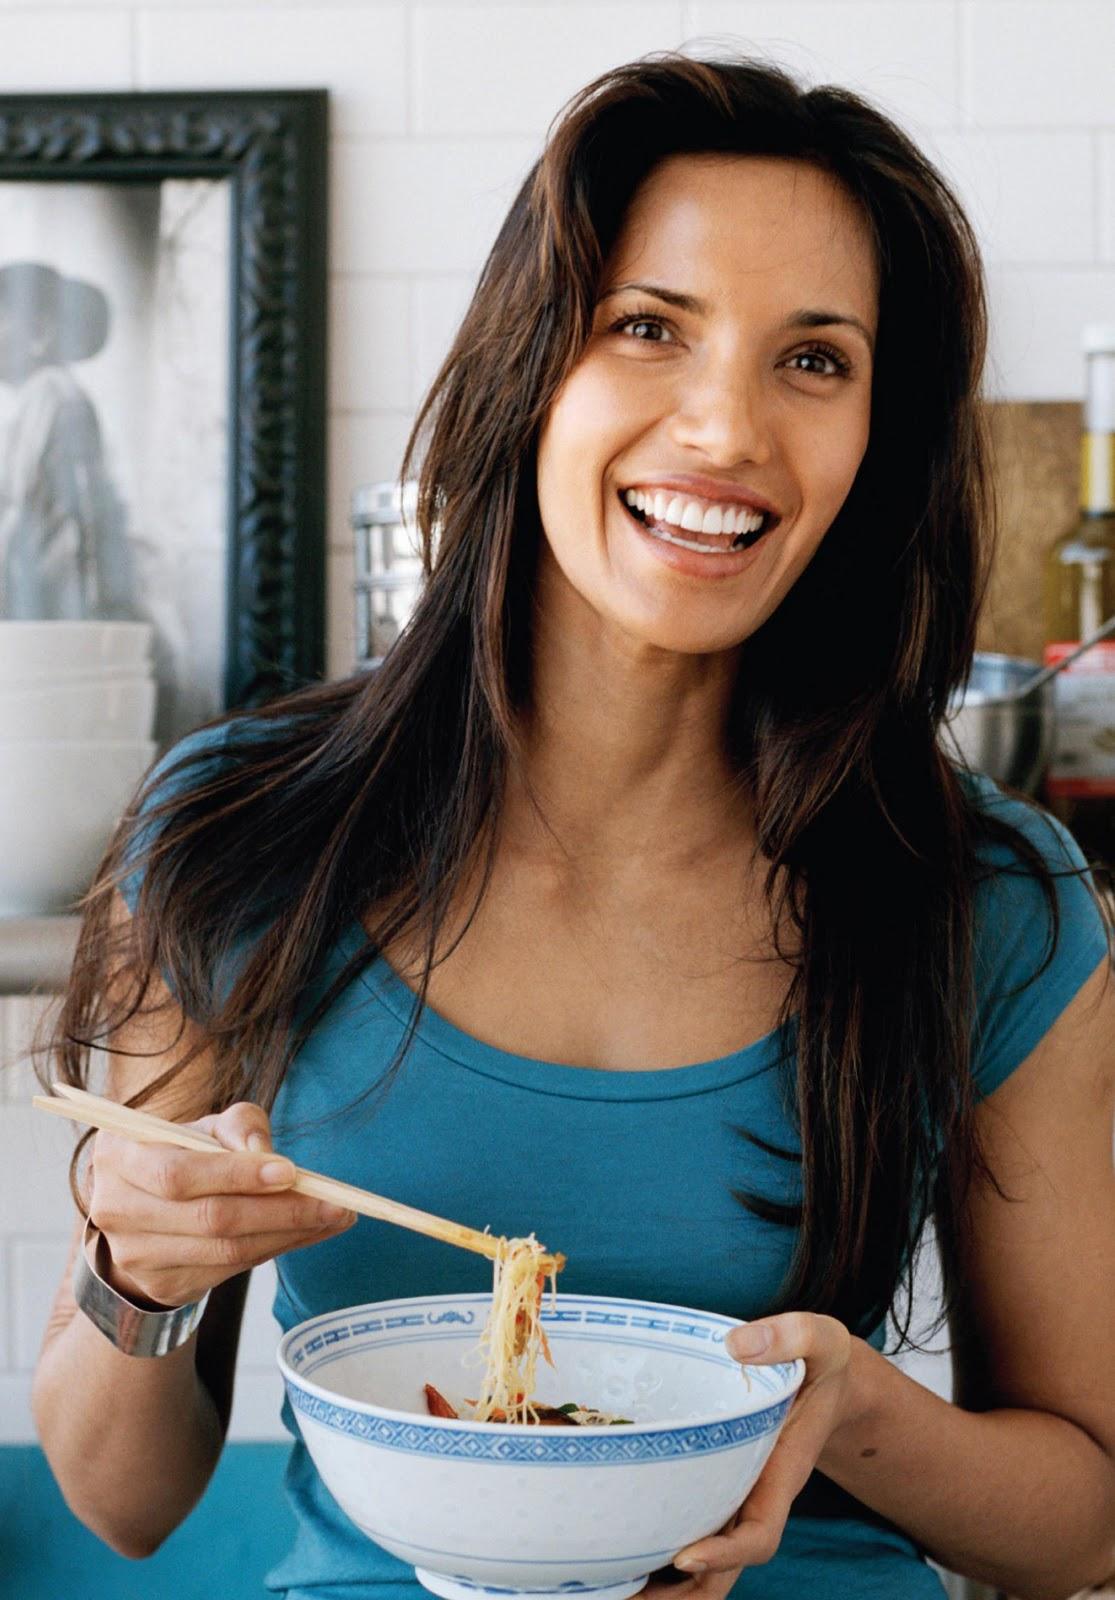 Congratulate, this chef padma lakshmi agree, this